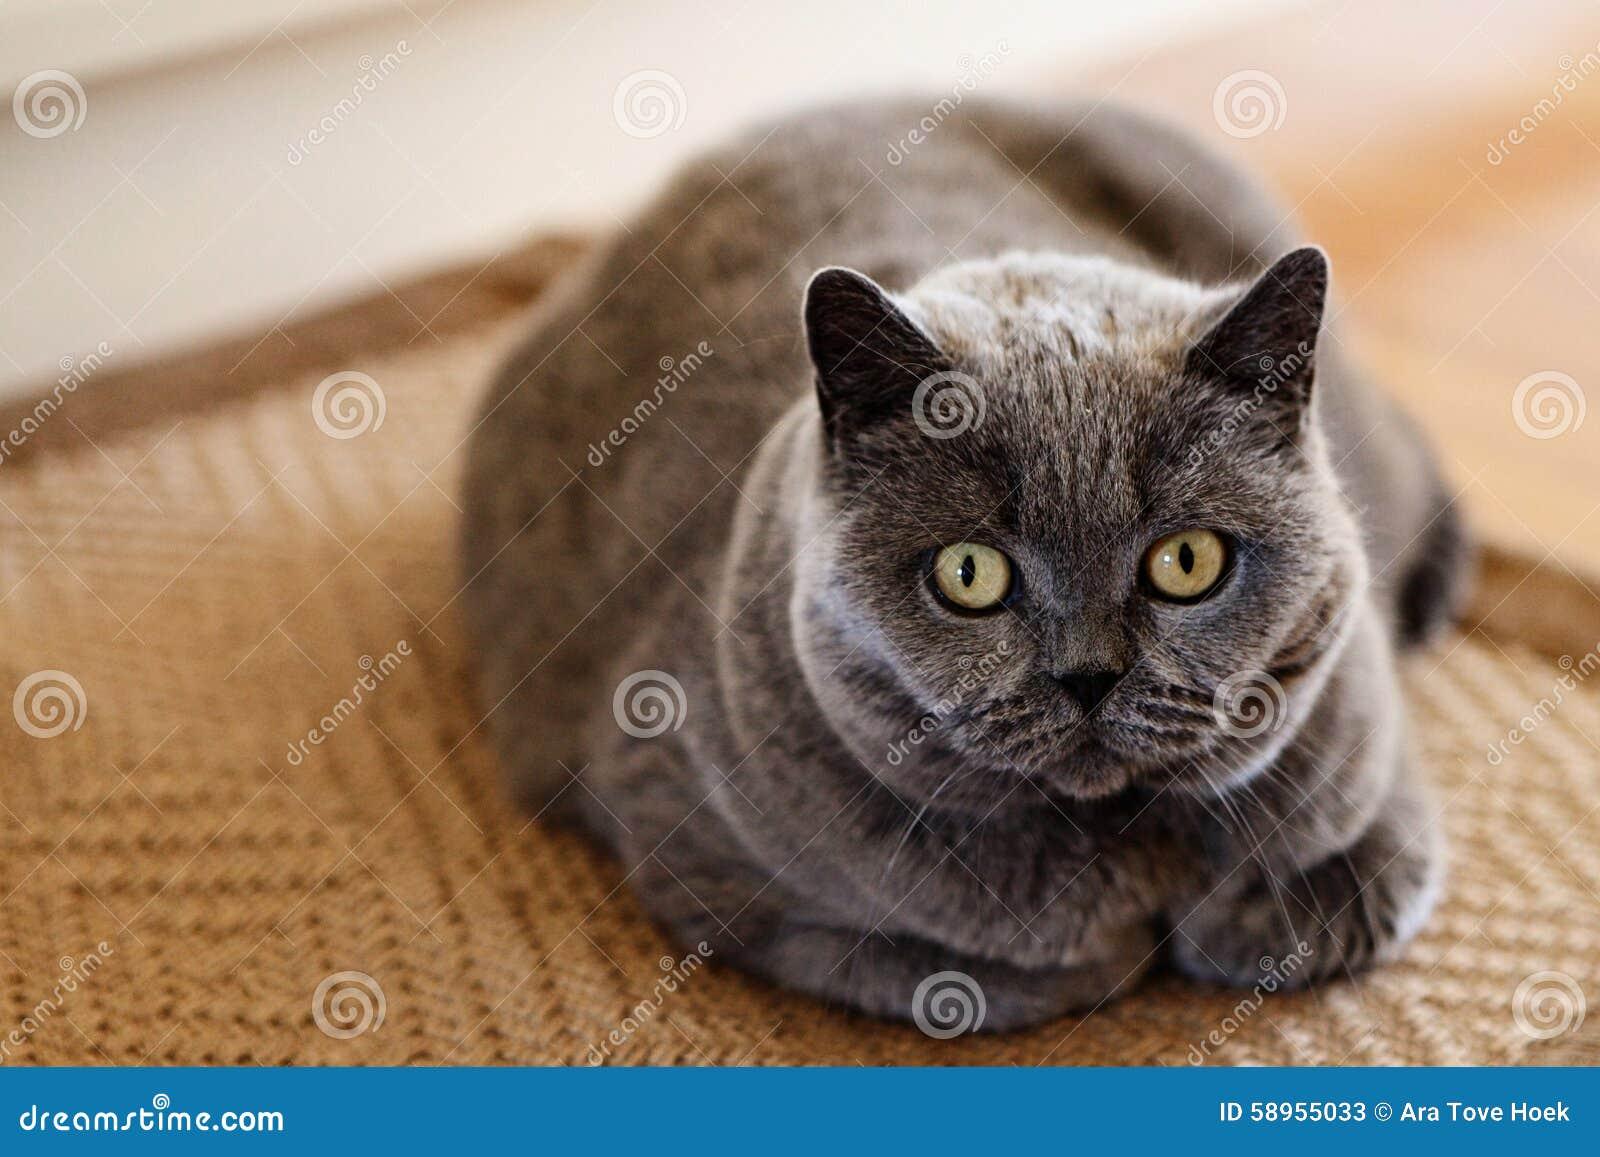 himalayan persian kitten